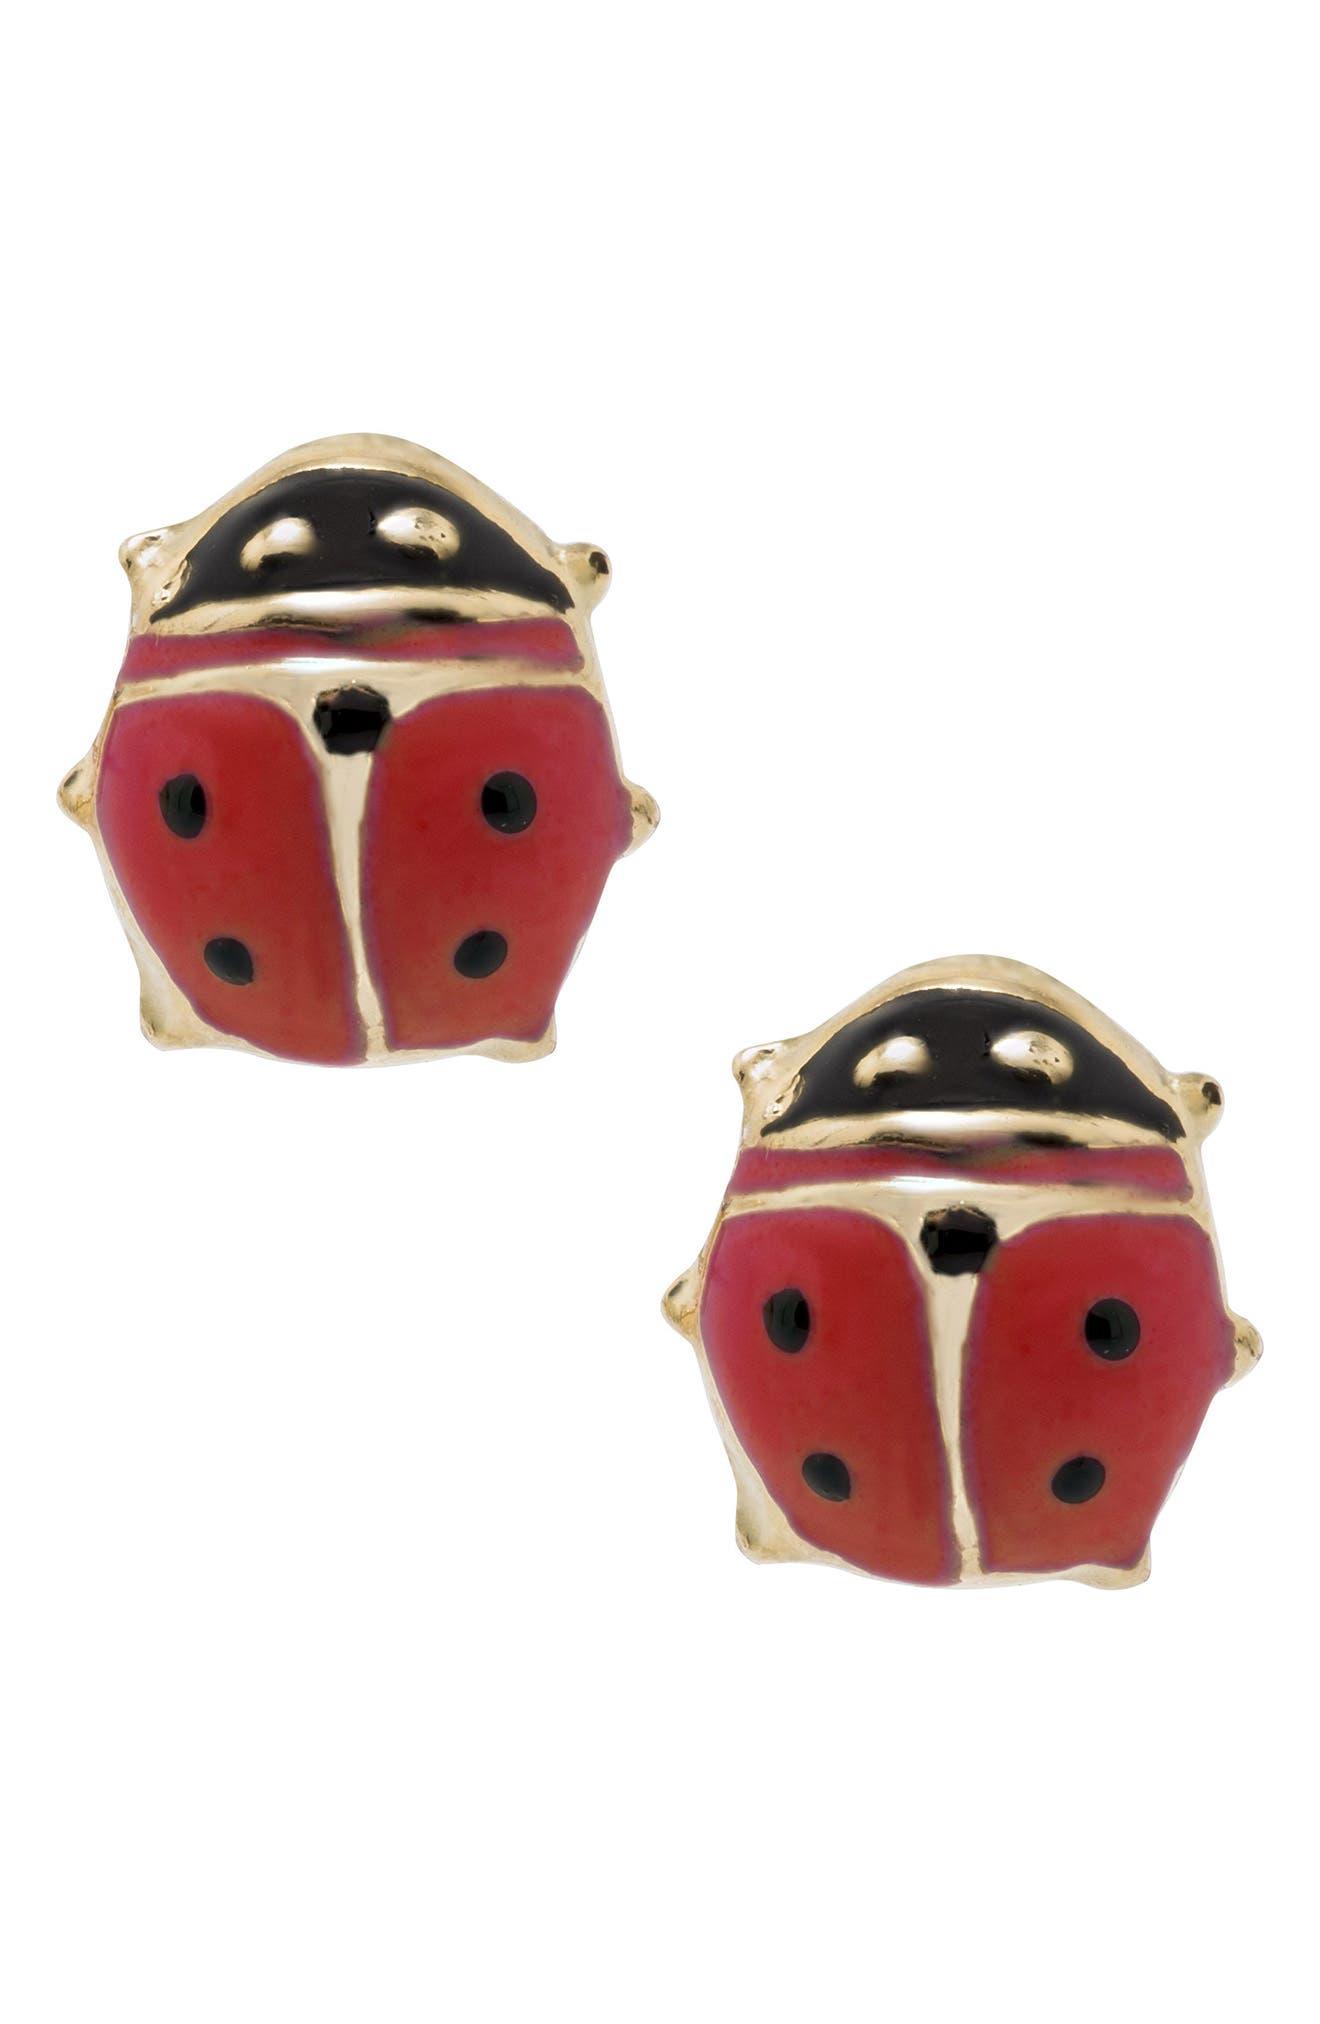 14k Gold & Enamel Ladybug Earrings,                         Main,                         color, RED/ GOLD